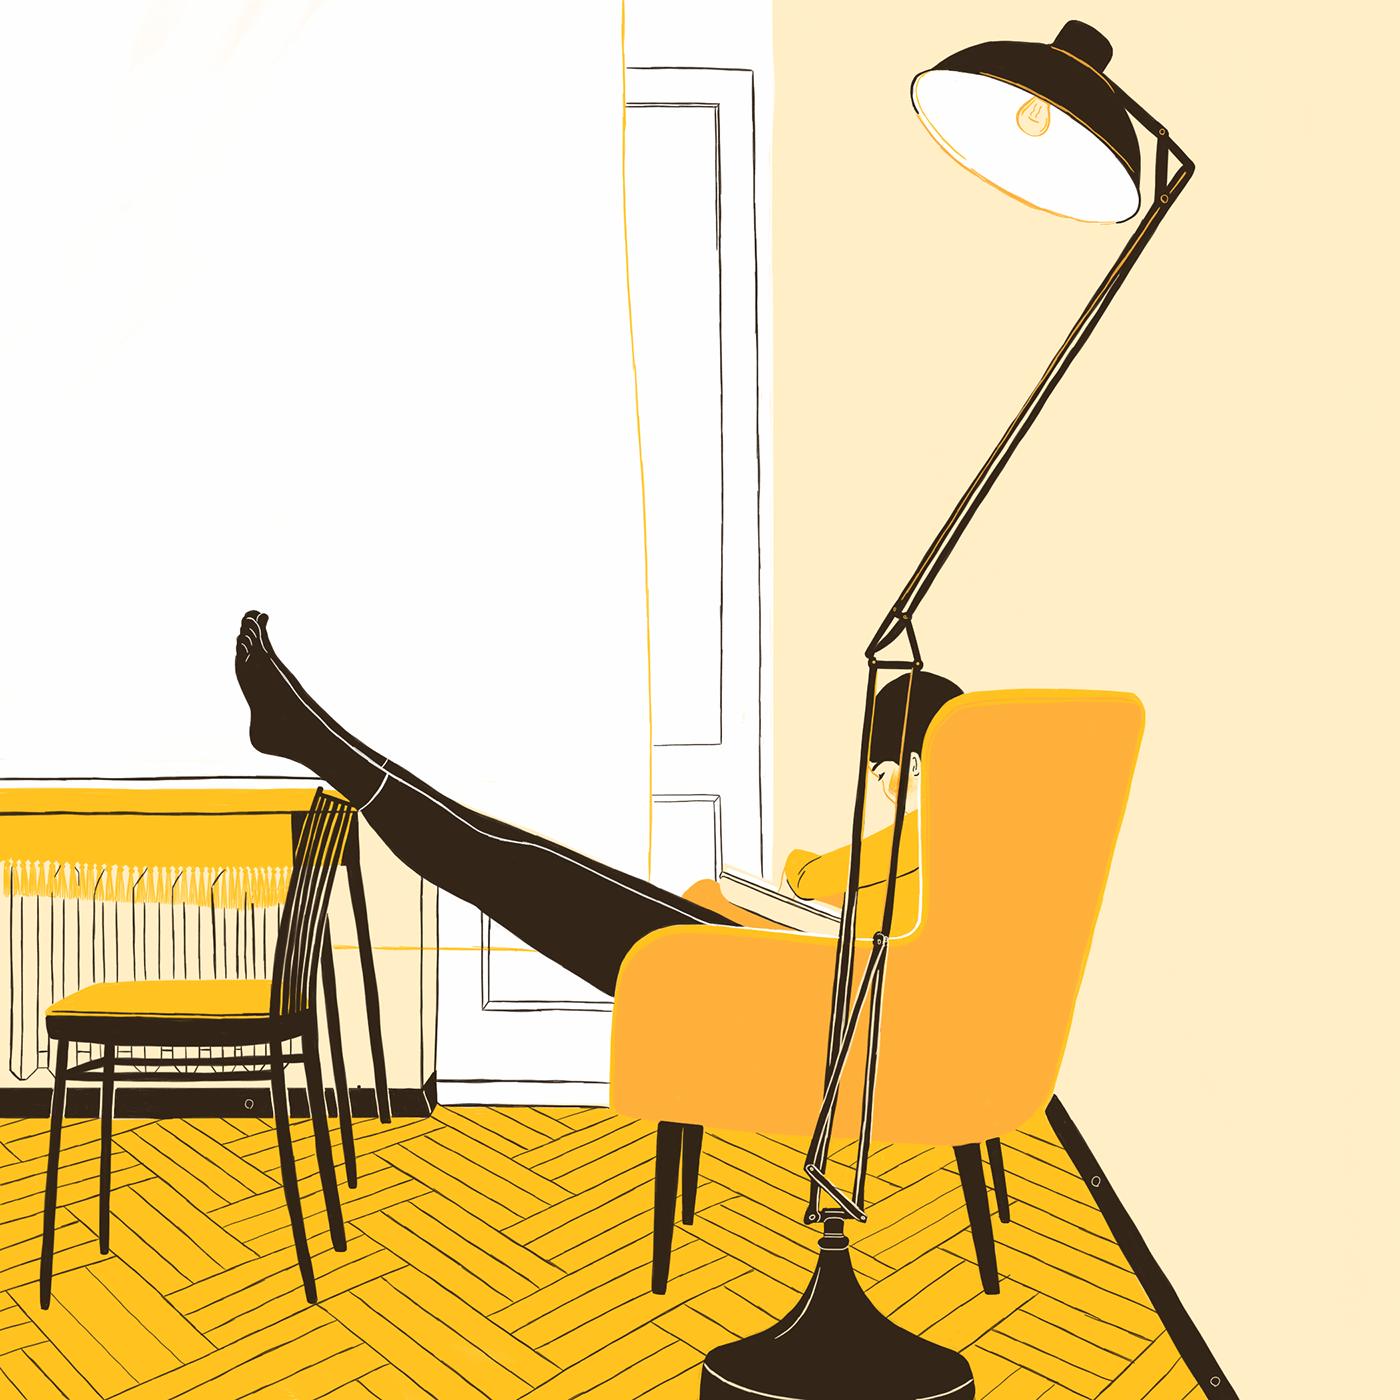 portrait in interior yellow